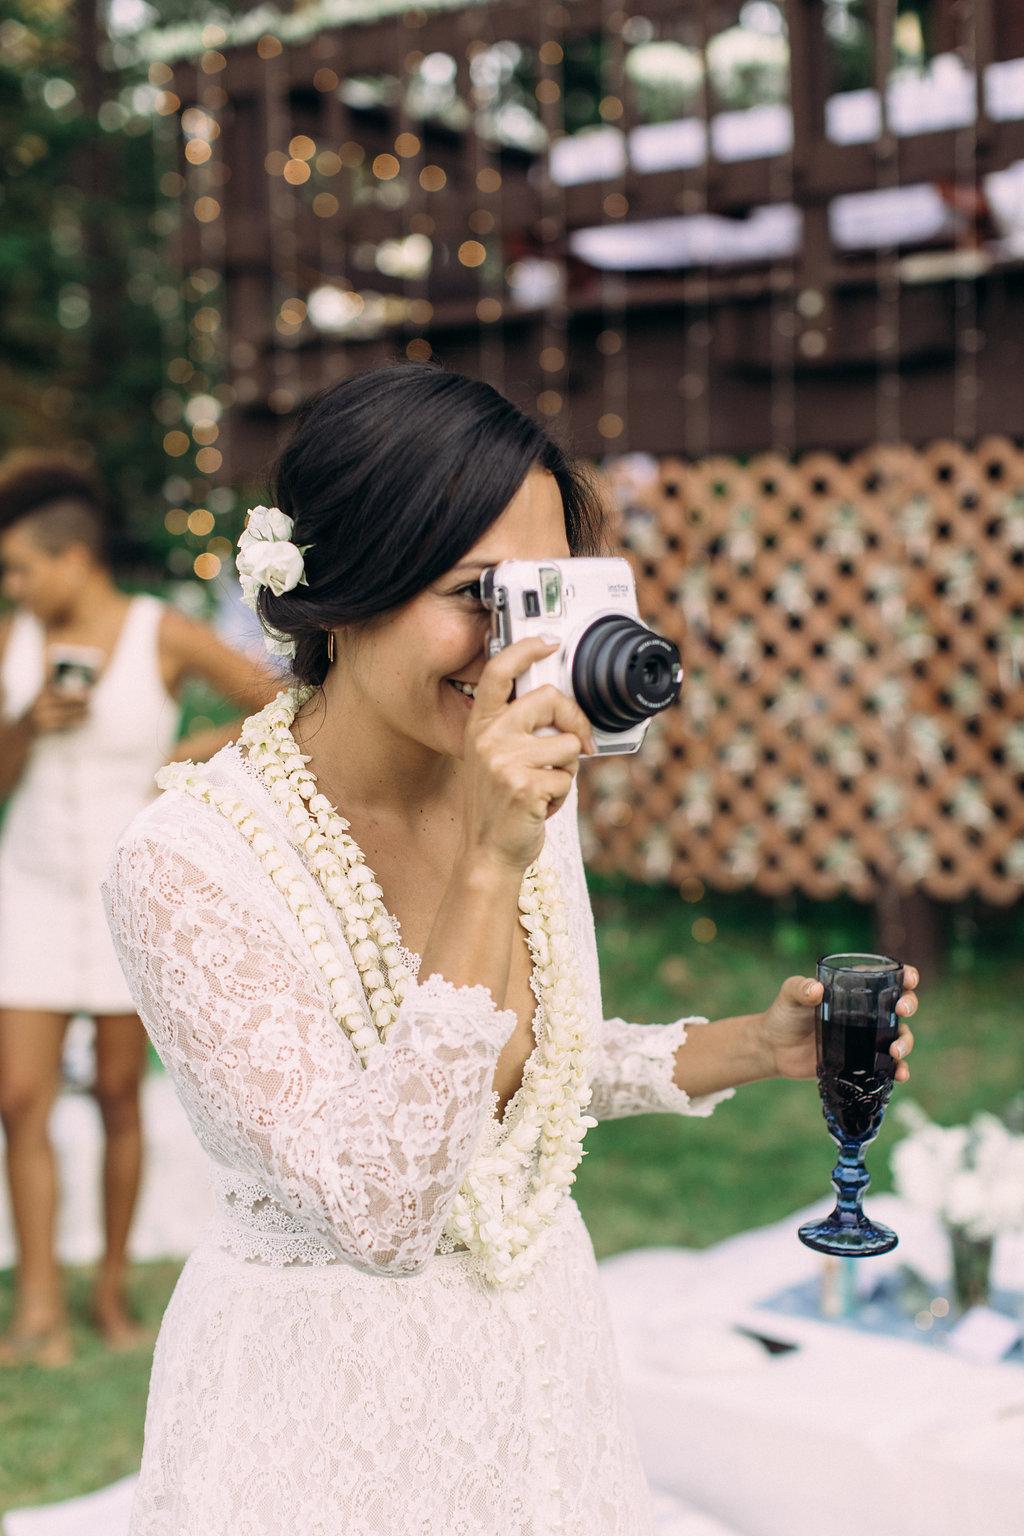 000040_gallardo_wedding0444.jpg